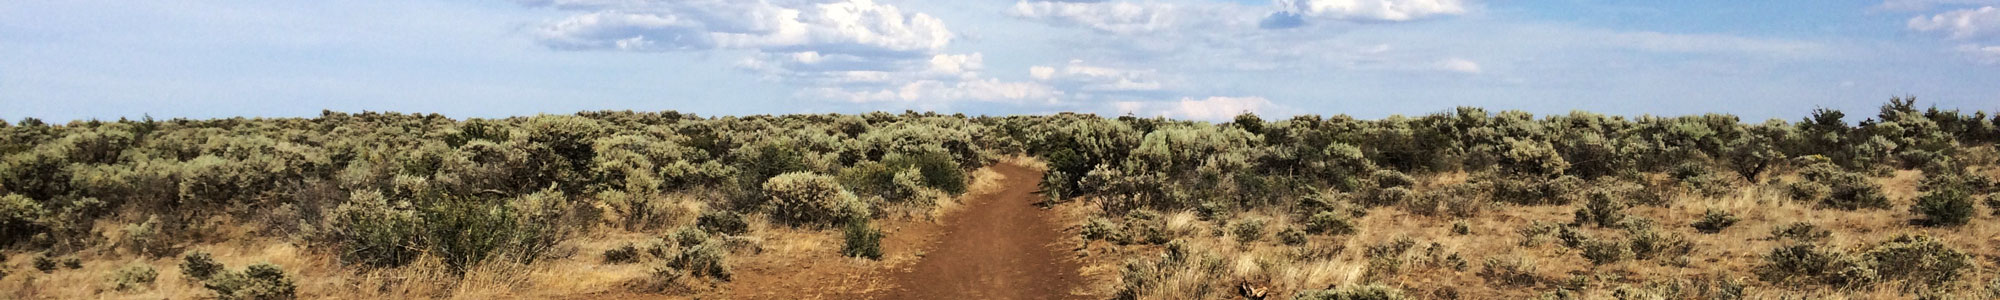 Cowiche Canyon Conservancy Uplands Hiking Recreation Yakima, WA Trails Shrub-Steppe Donate